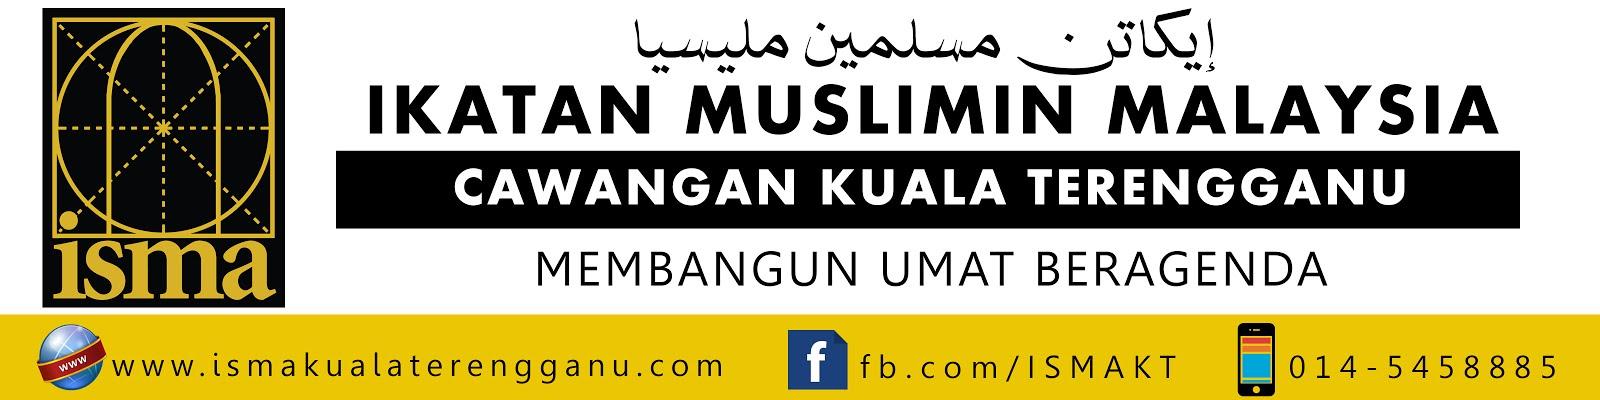 Ikatan Muslimin Malaysia (Isma) Kuala Terengganu